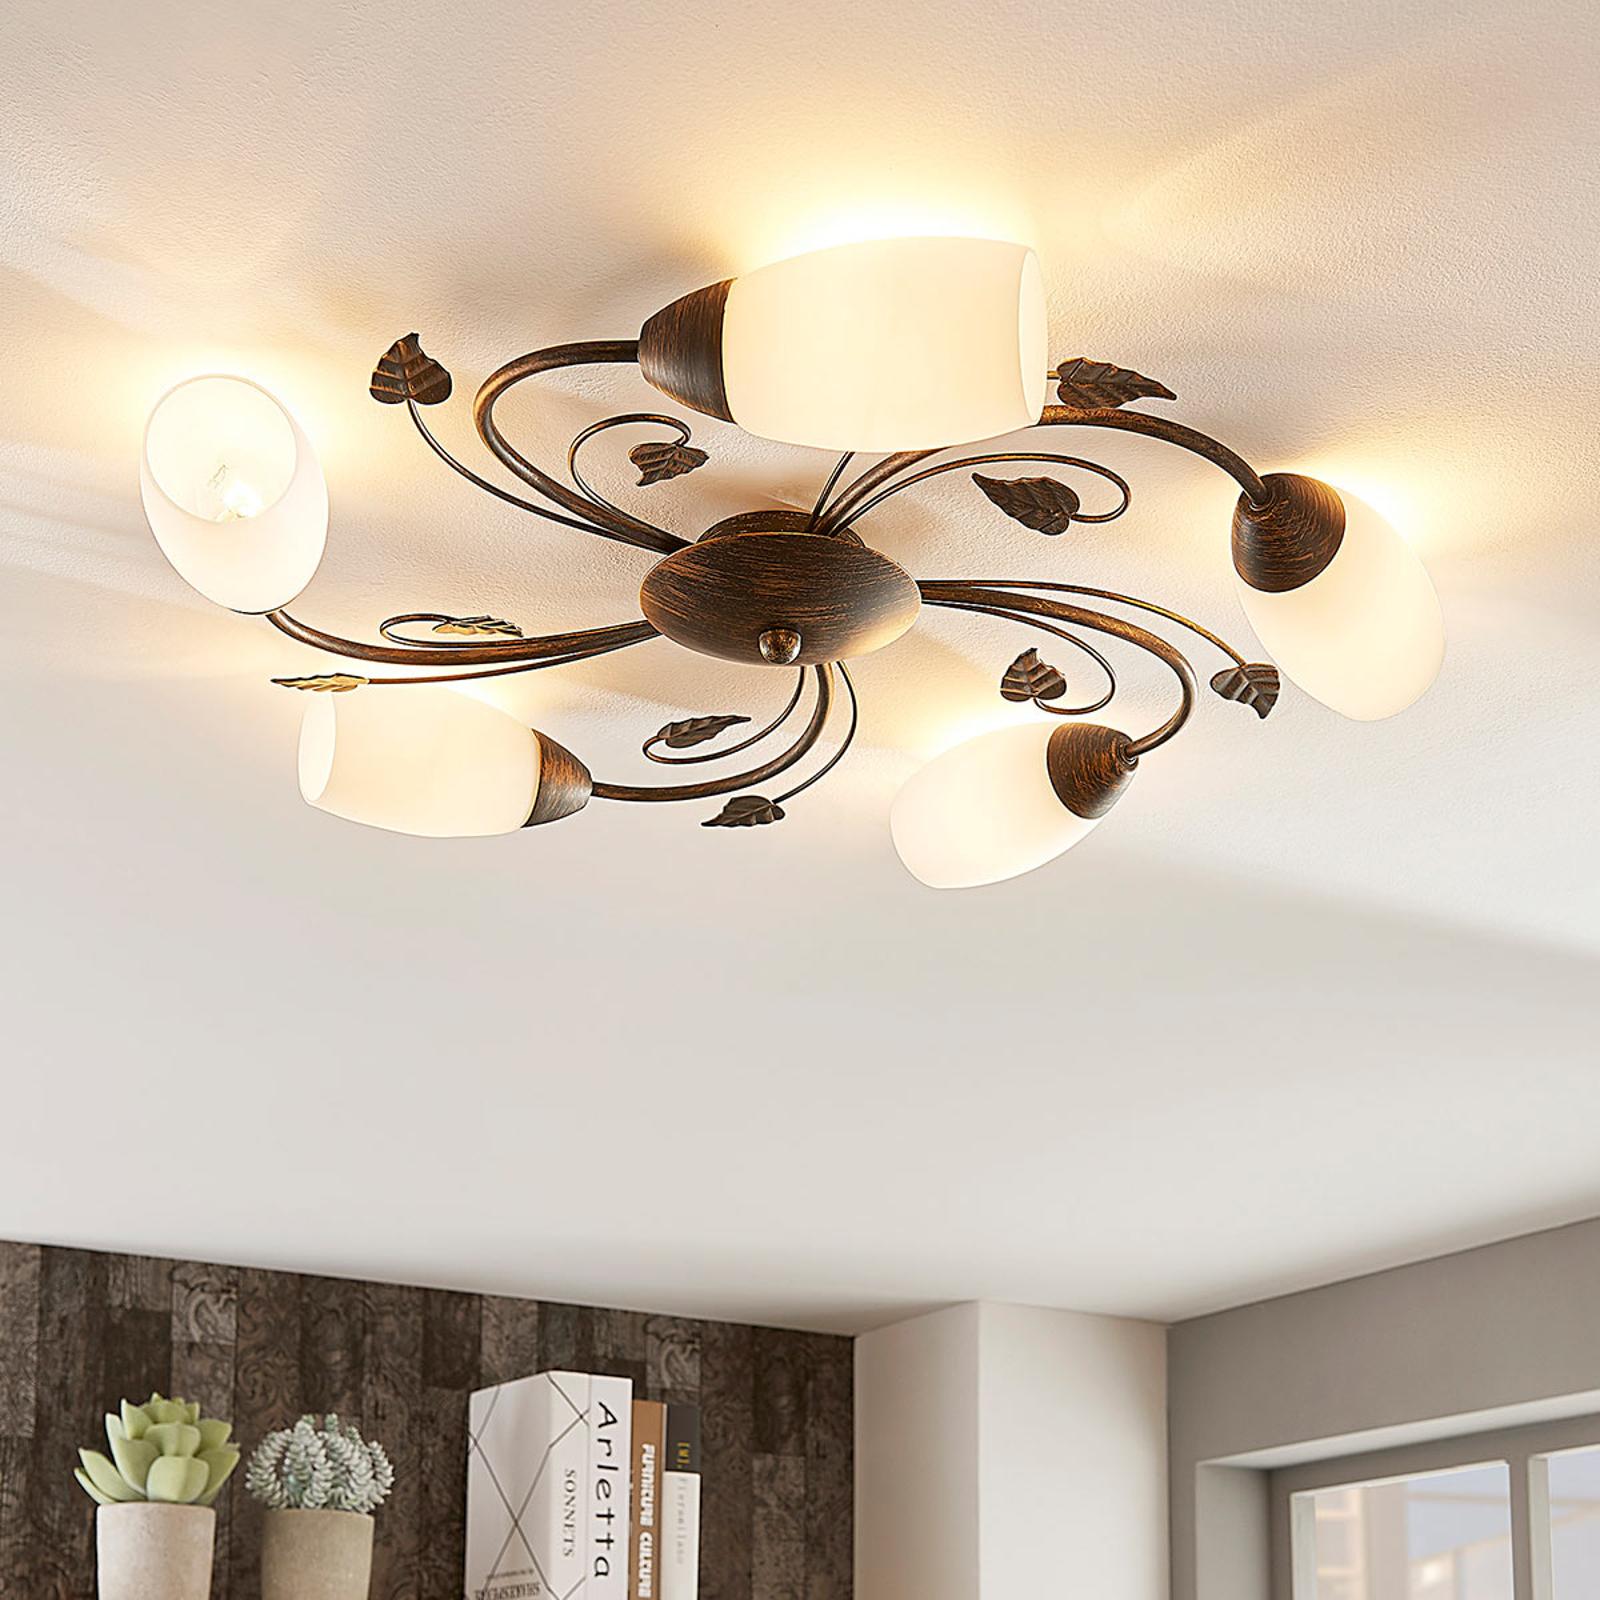 Stefania - elegantti kattolamppu, LED